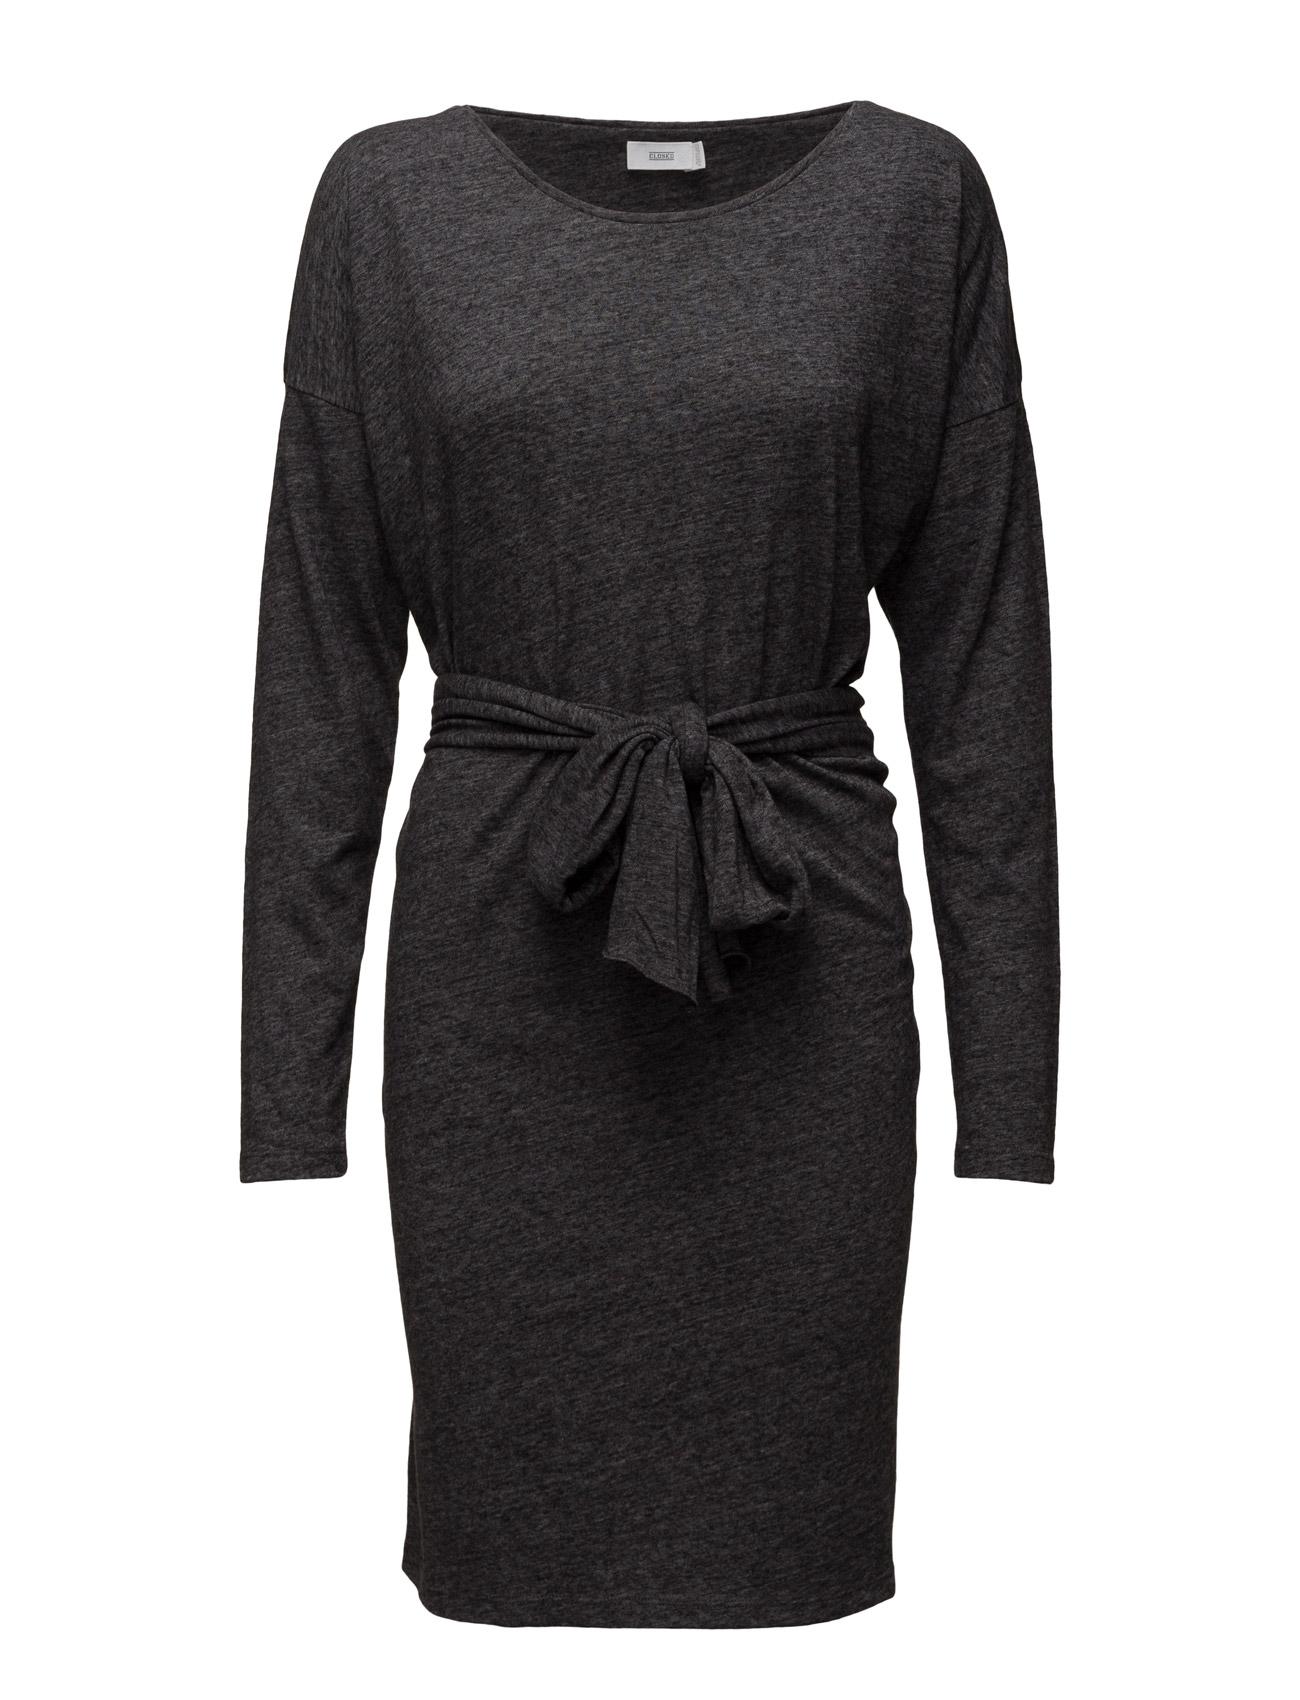 Womens Dress CLOSED Striktøj til Kvinder i Mørk grå